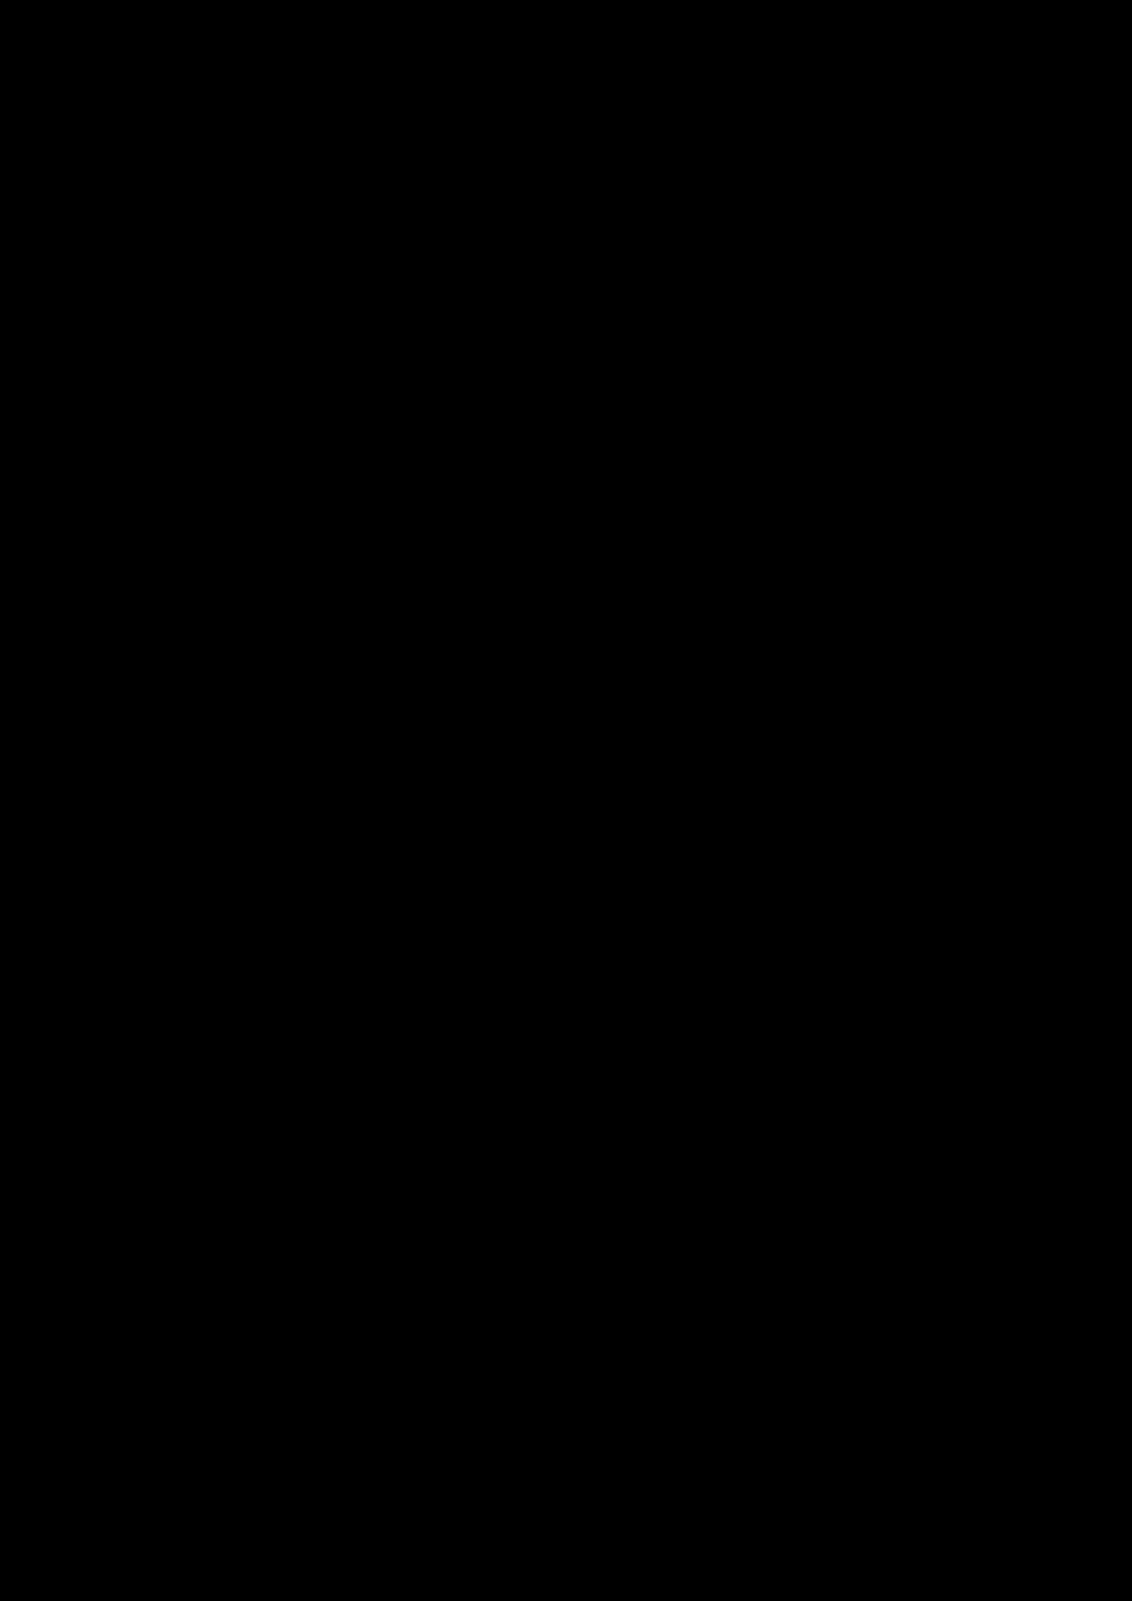 Mrs. Vandebilt slide, Image 49